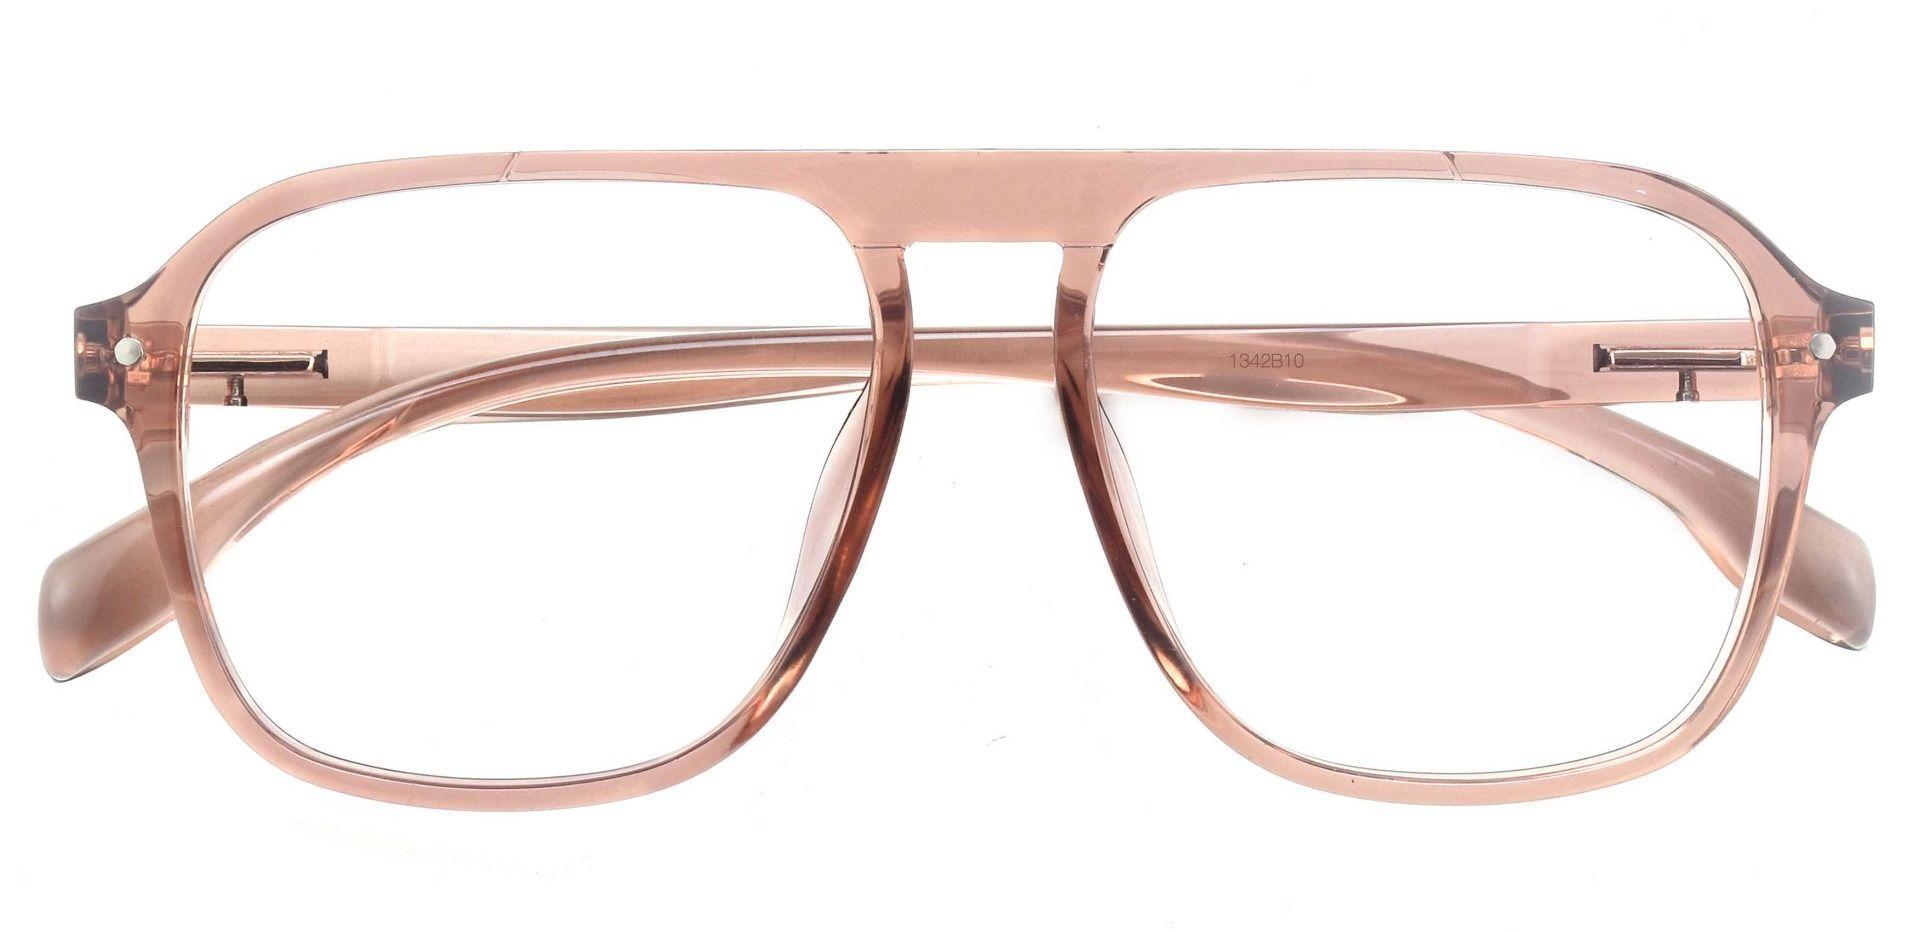 Gideon Aviator Progressive Glasses - Brown